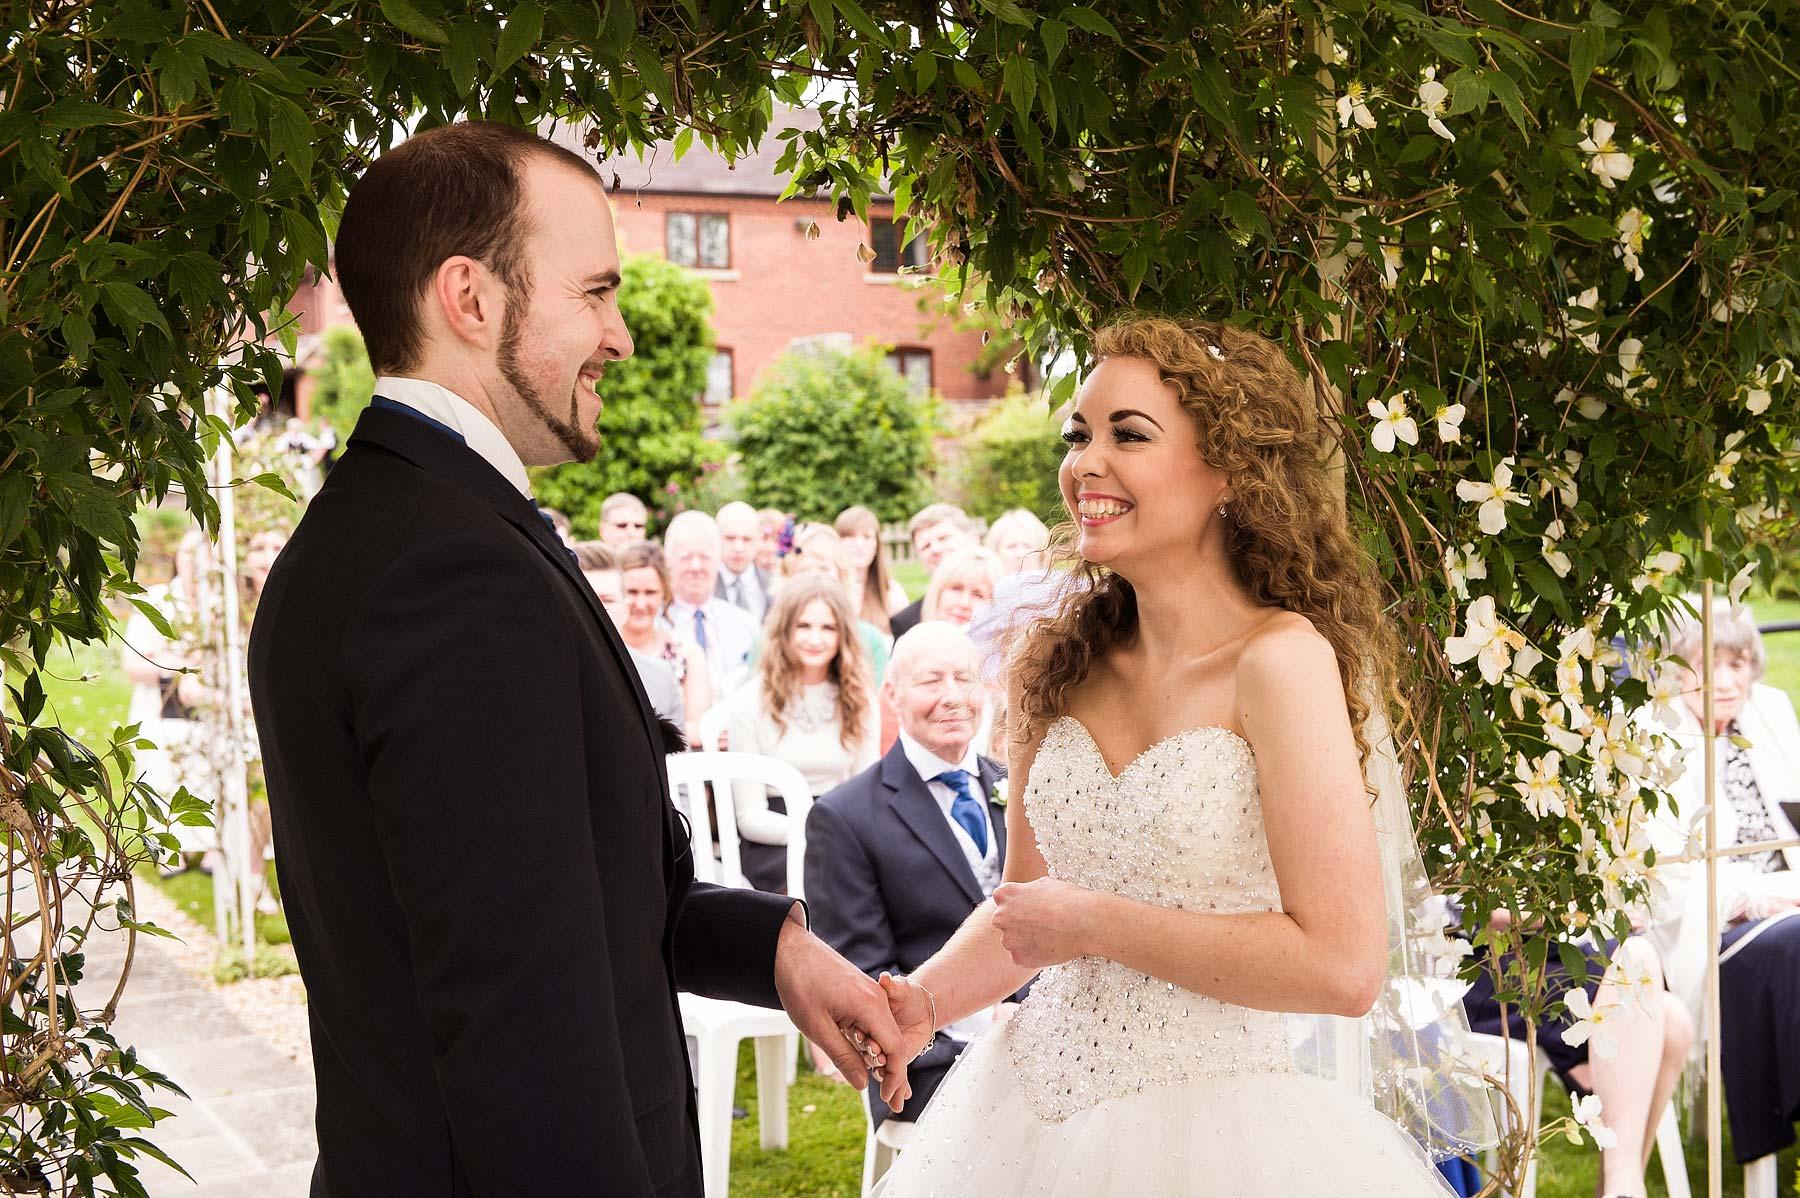 albright-hussey-manor-wedding-photographers-031